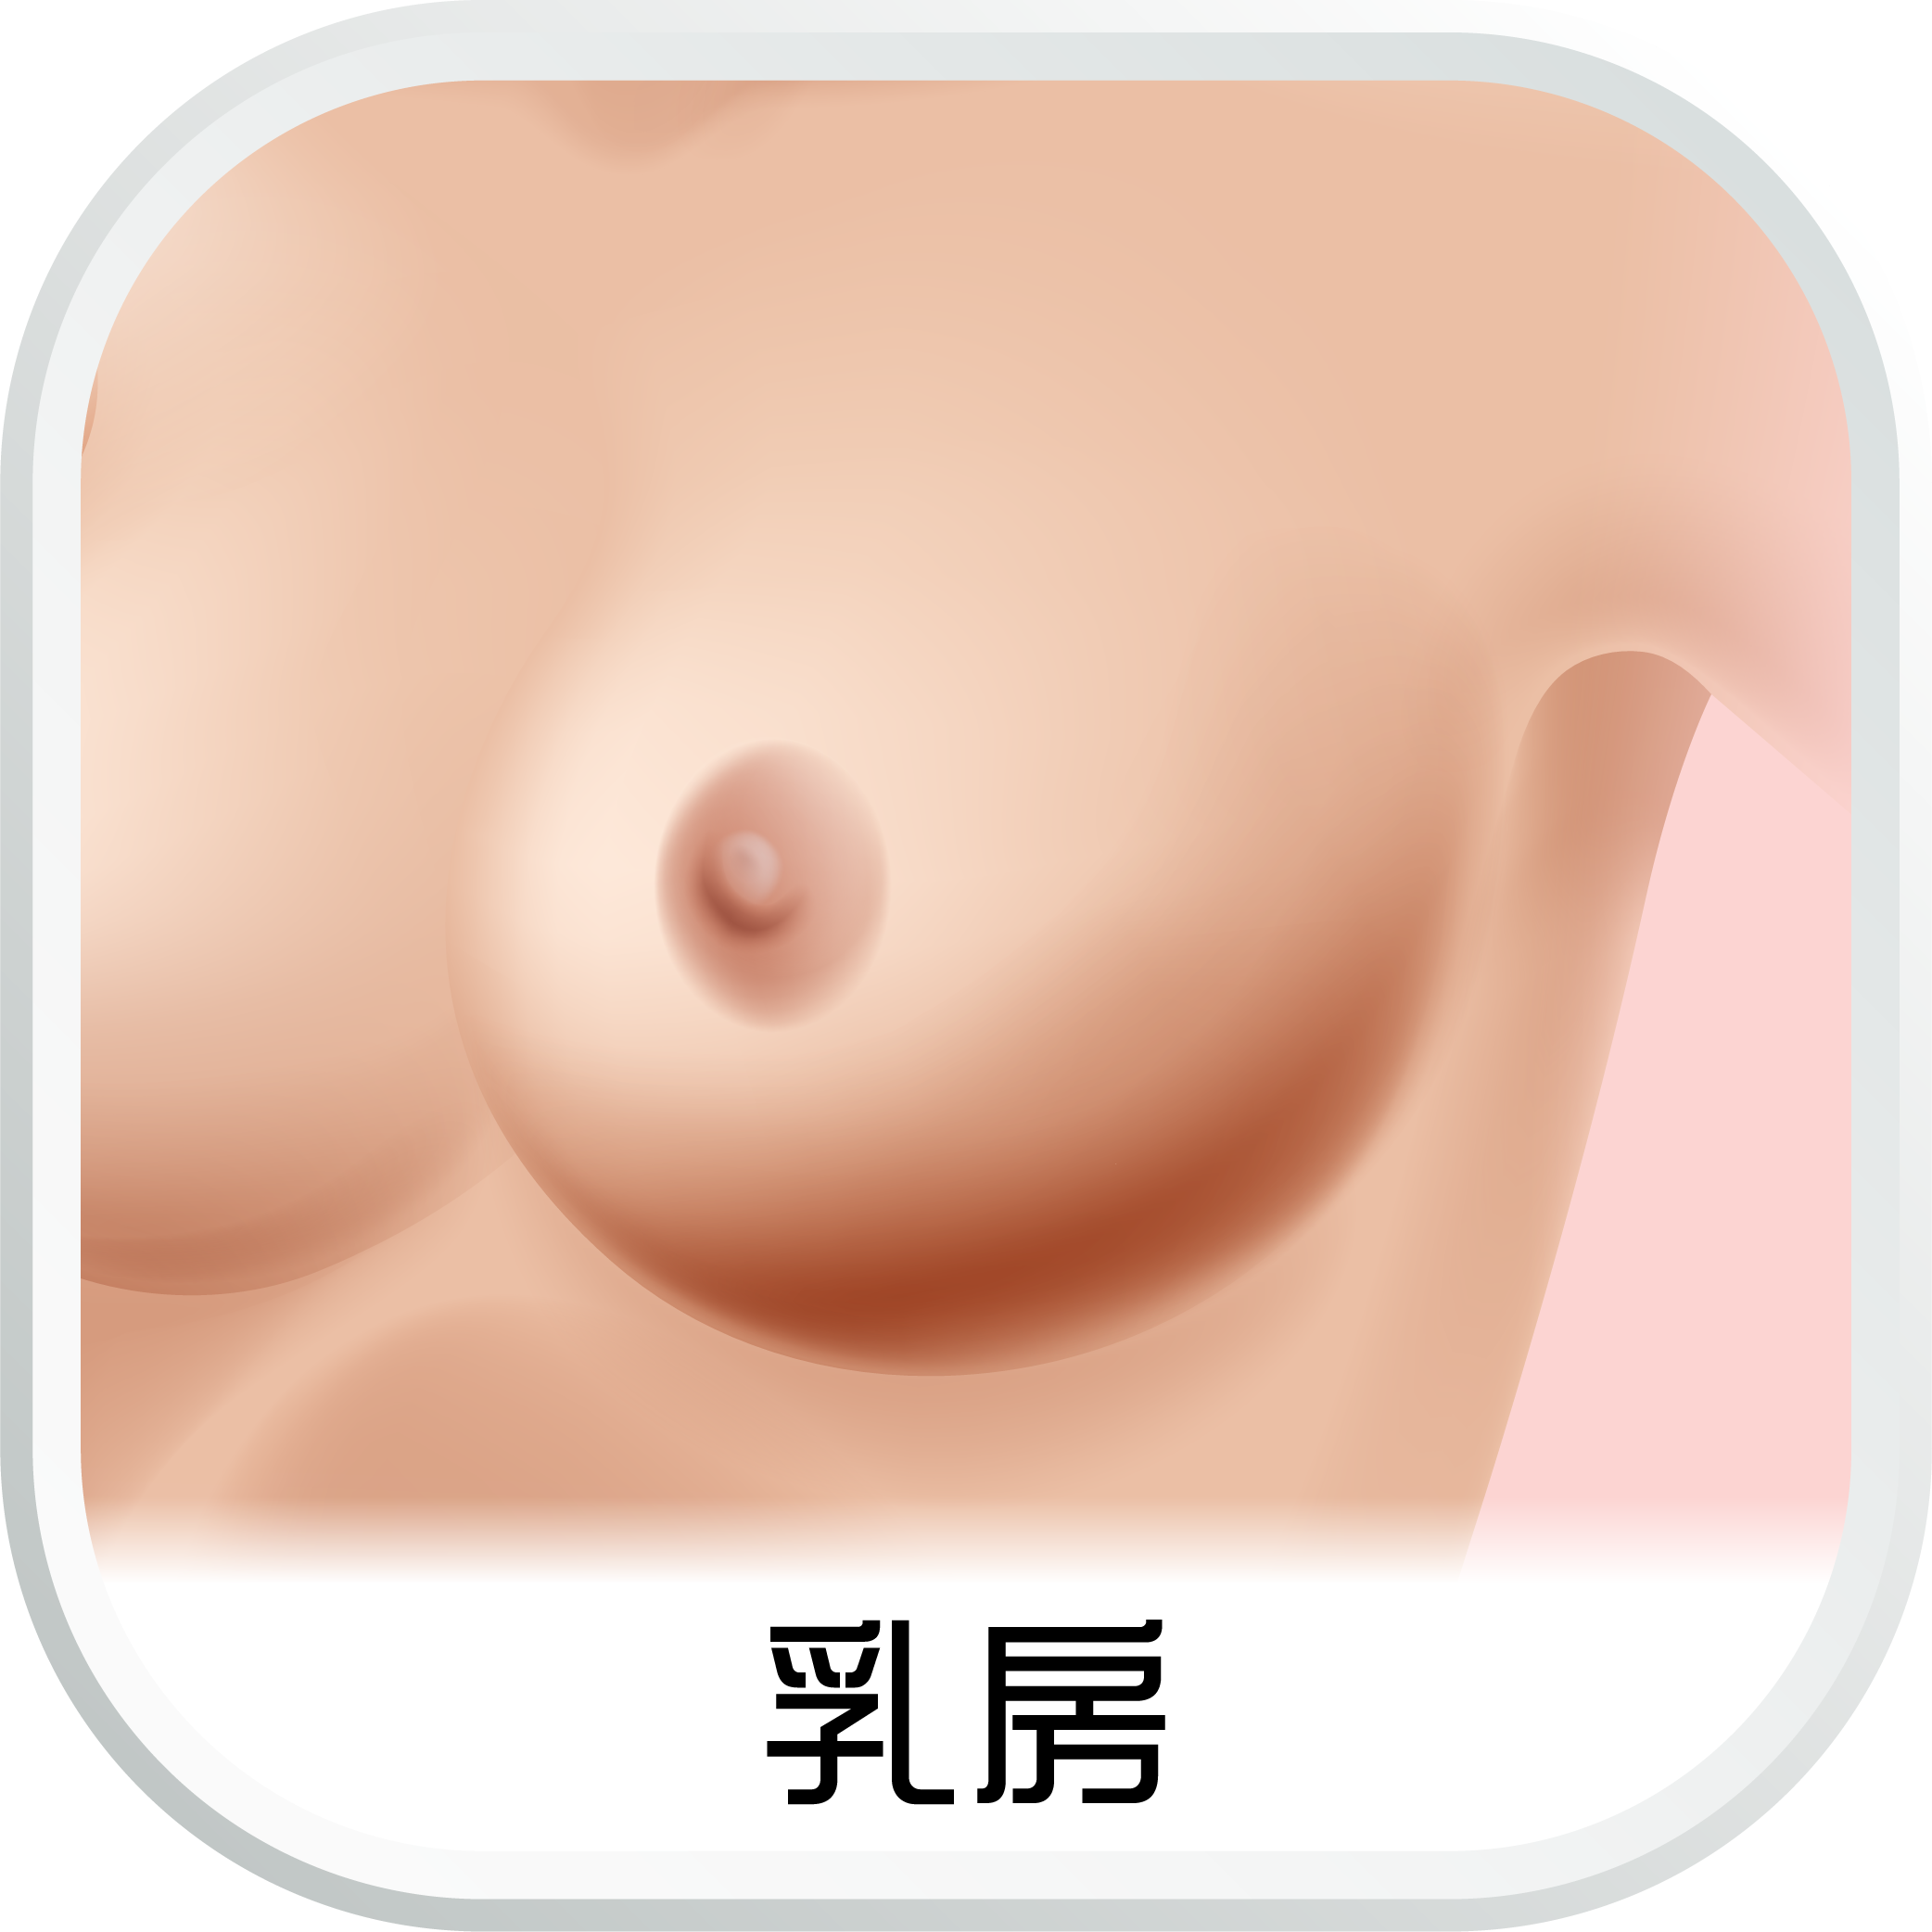 EHC_SubCat_aw_乳房